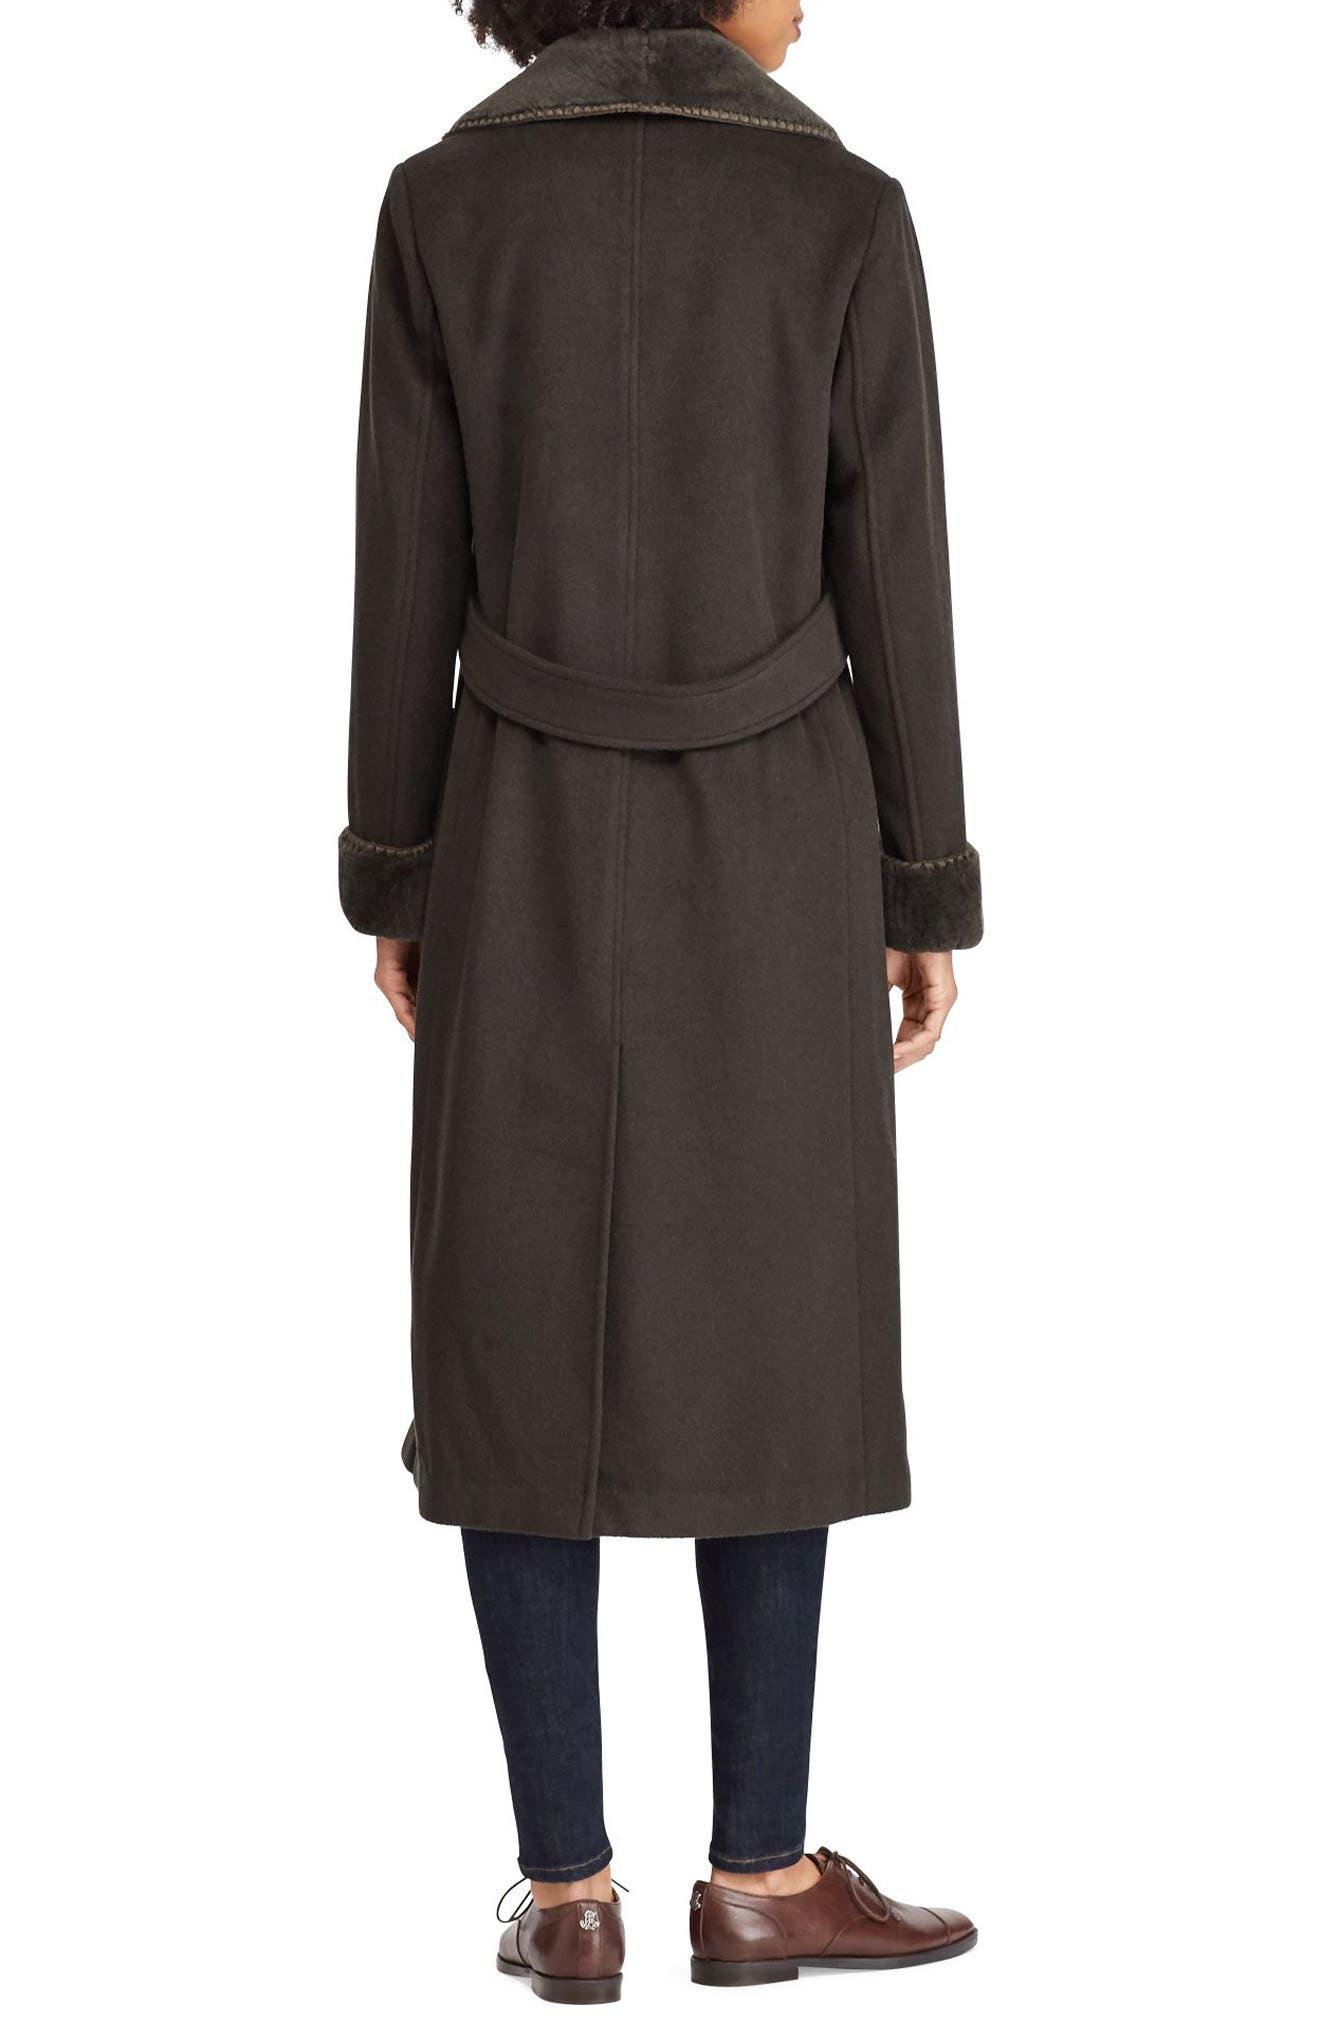 Wool Blend Faux Shearling Trim Coat,                             Alternate thumbnail 2, color,                             MILITARY GREEN